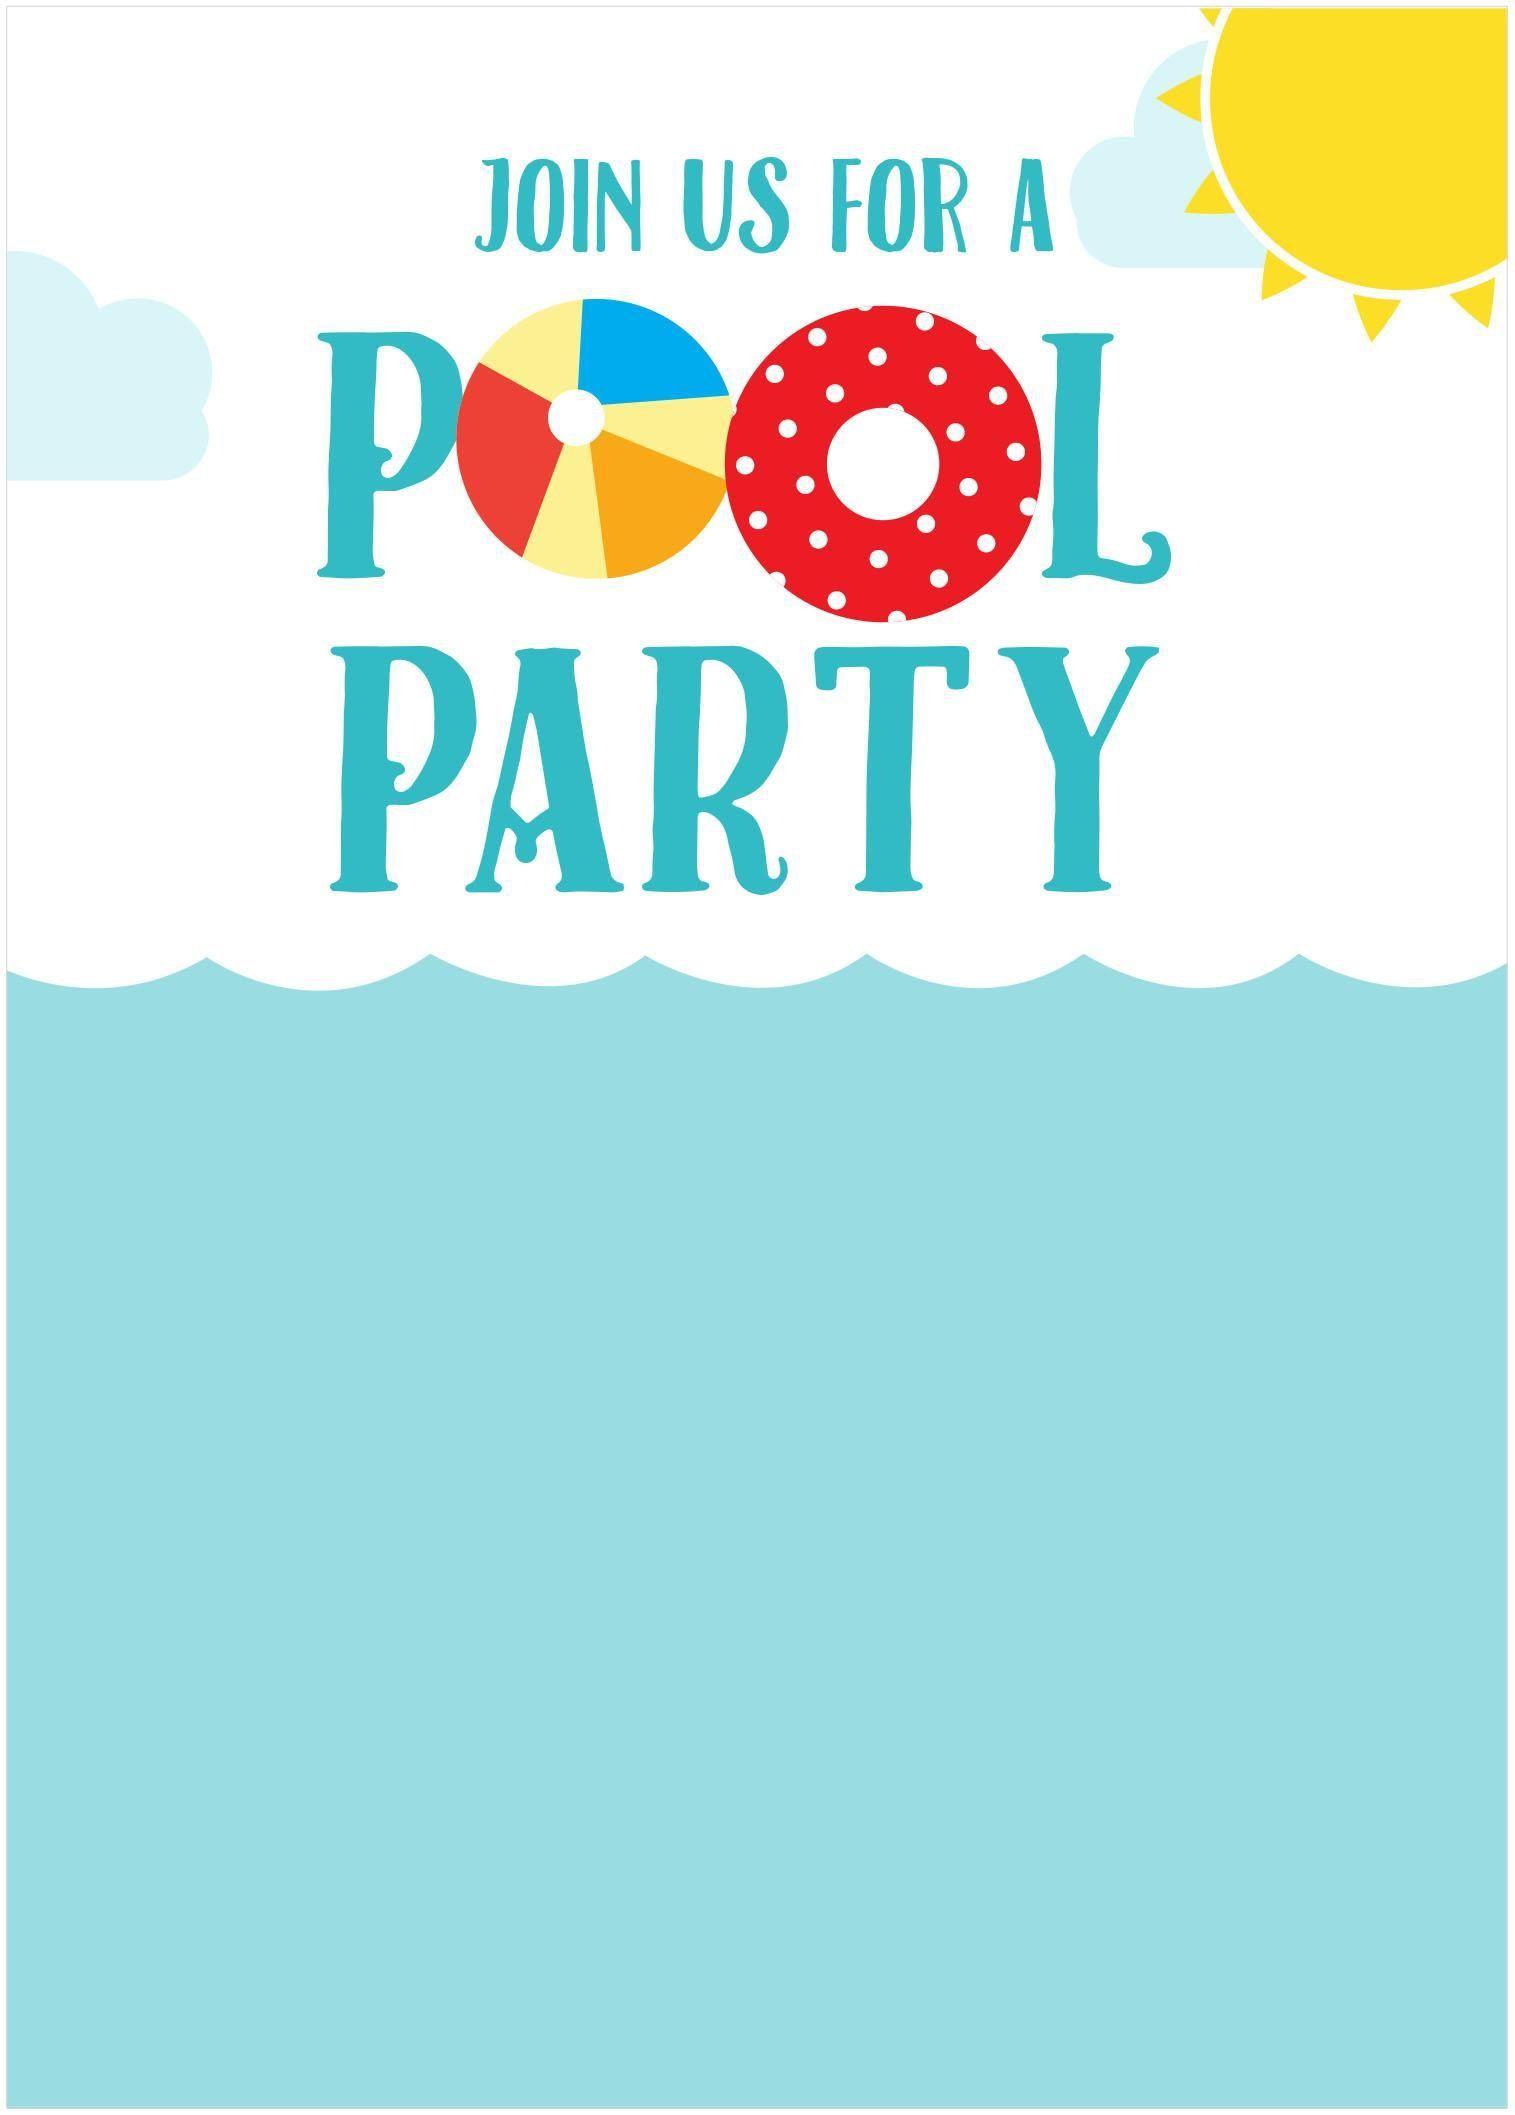 004 Impressive Party Invite Template Free Idea  Ugly Sweater Invitation Word Christma Printable Swimming UkFull